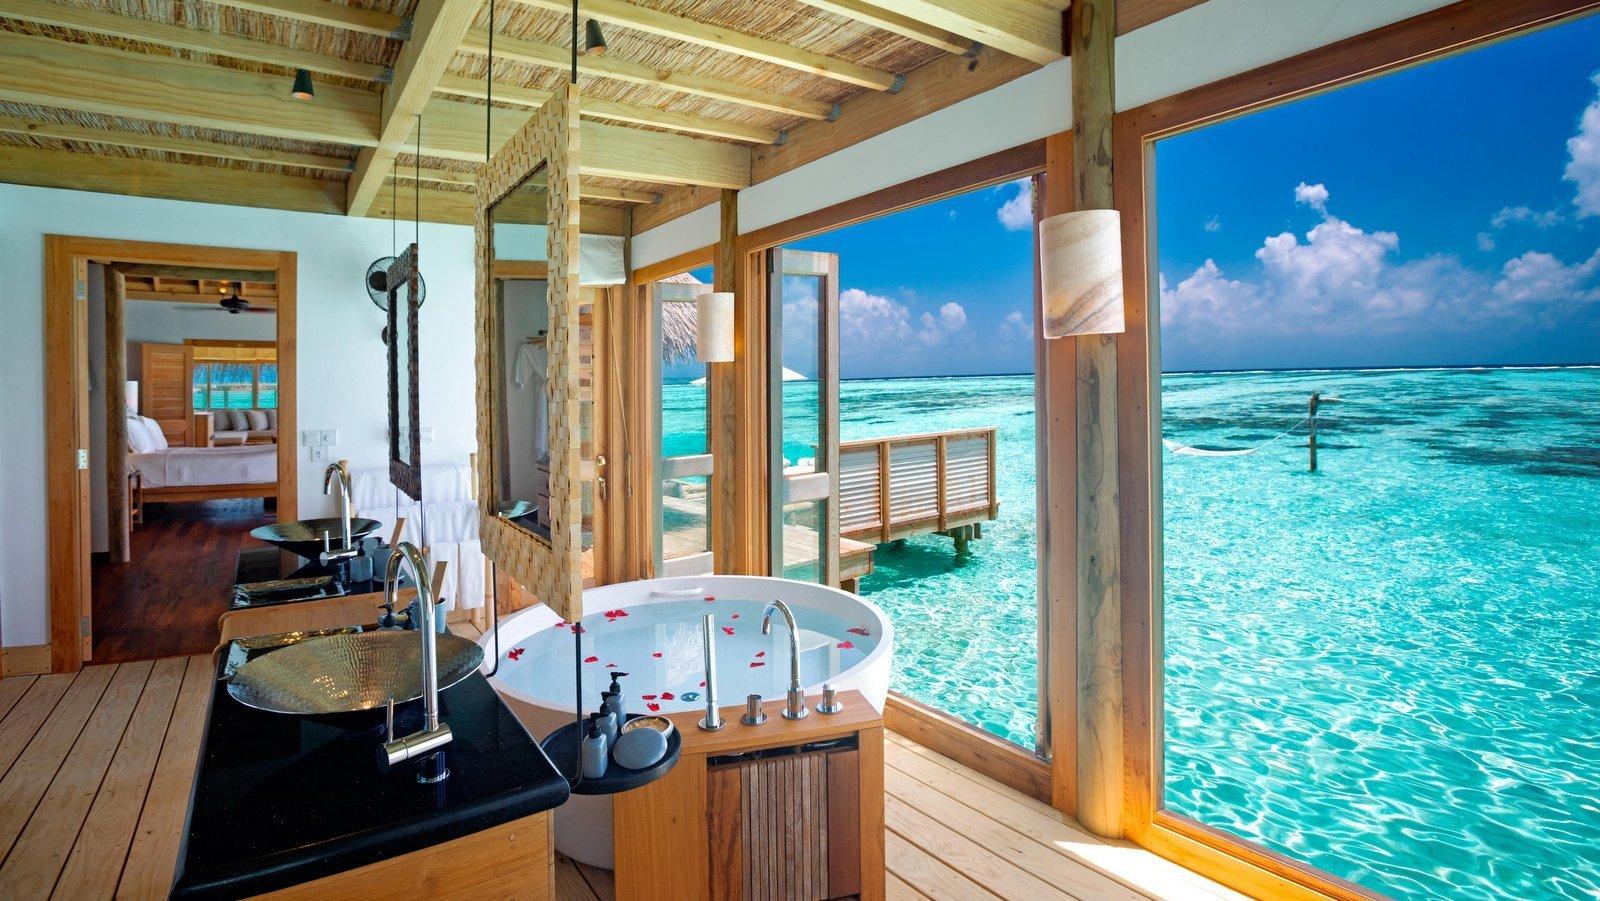 Мальдивы, отель Gili Lankanfushi Maldives, номер The Private Reserve